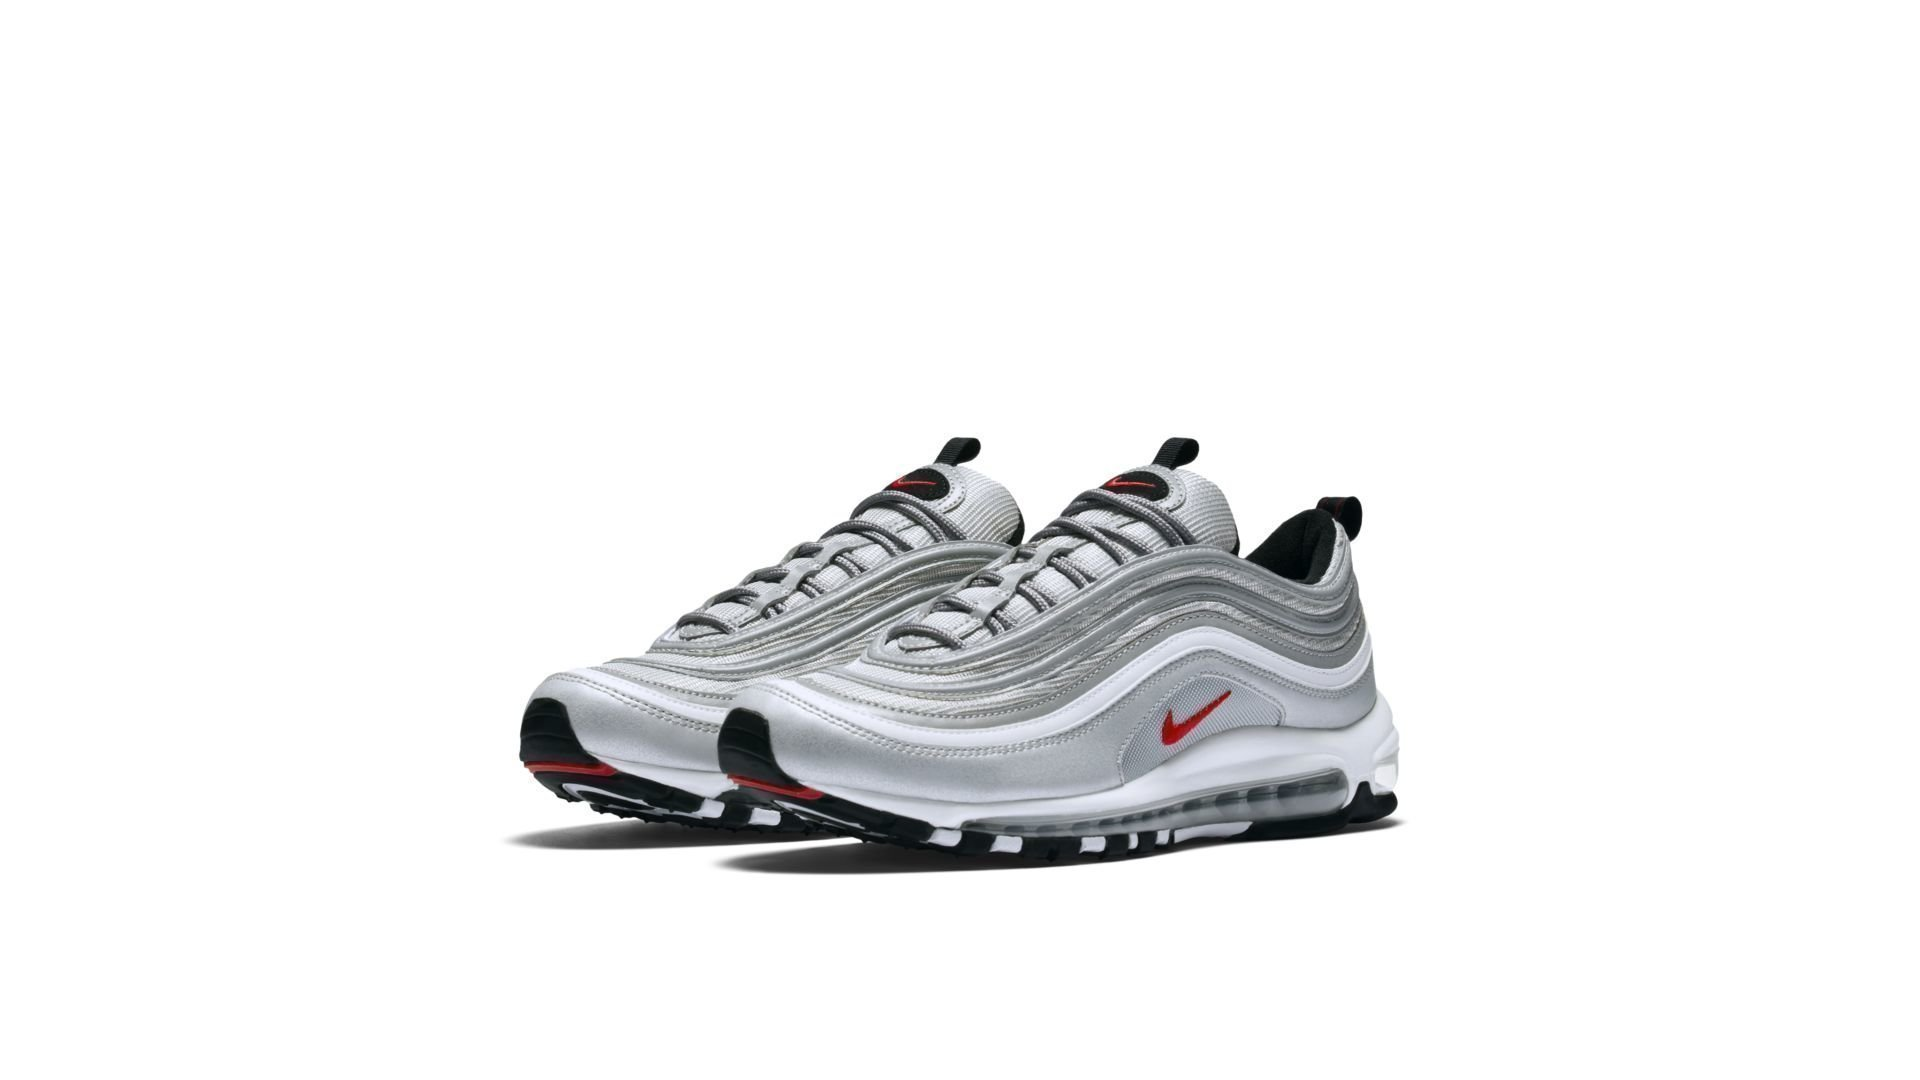 Nike Air Max 97 'Silver Bullet' (884421 001)